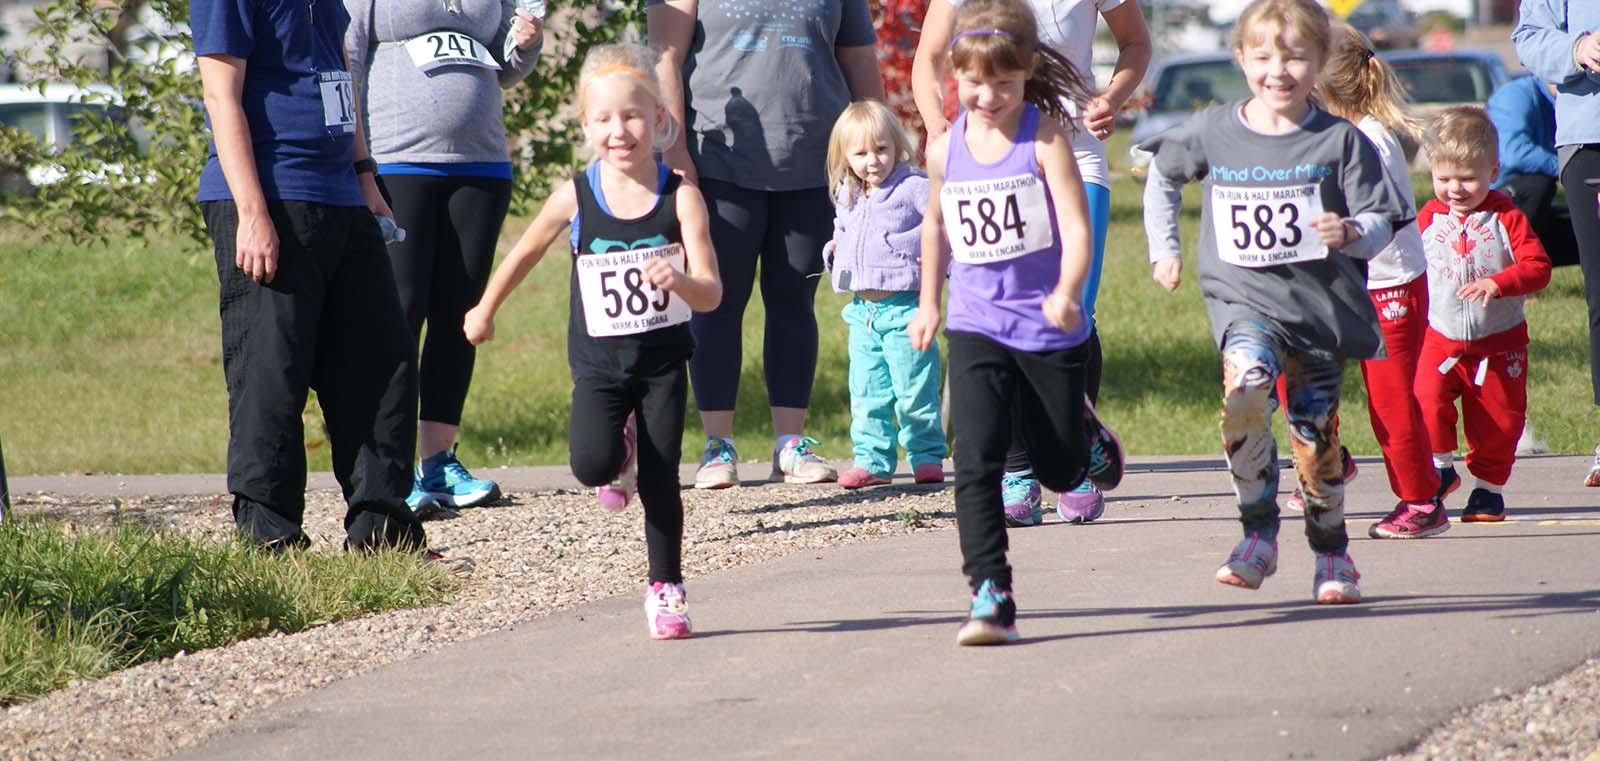 Children running in a races